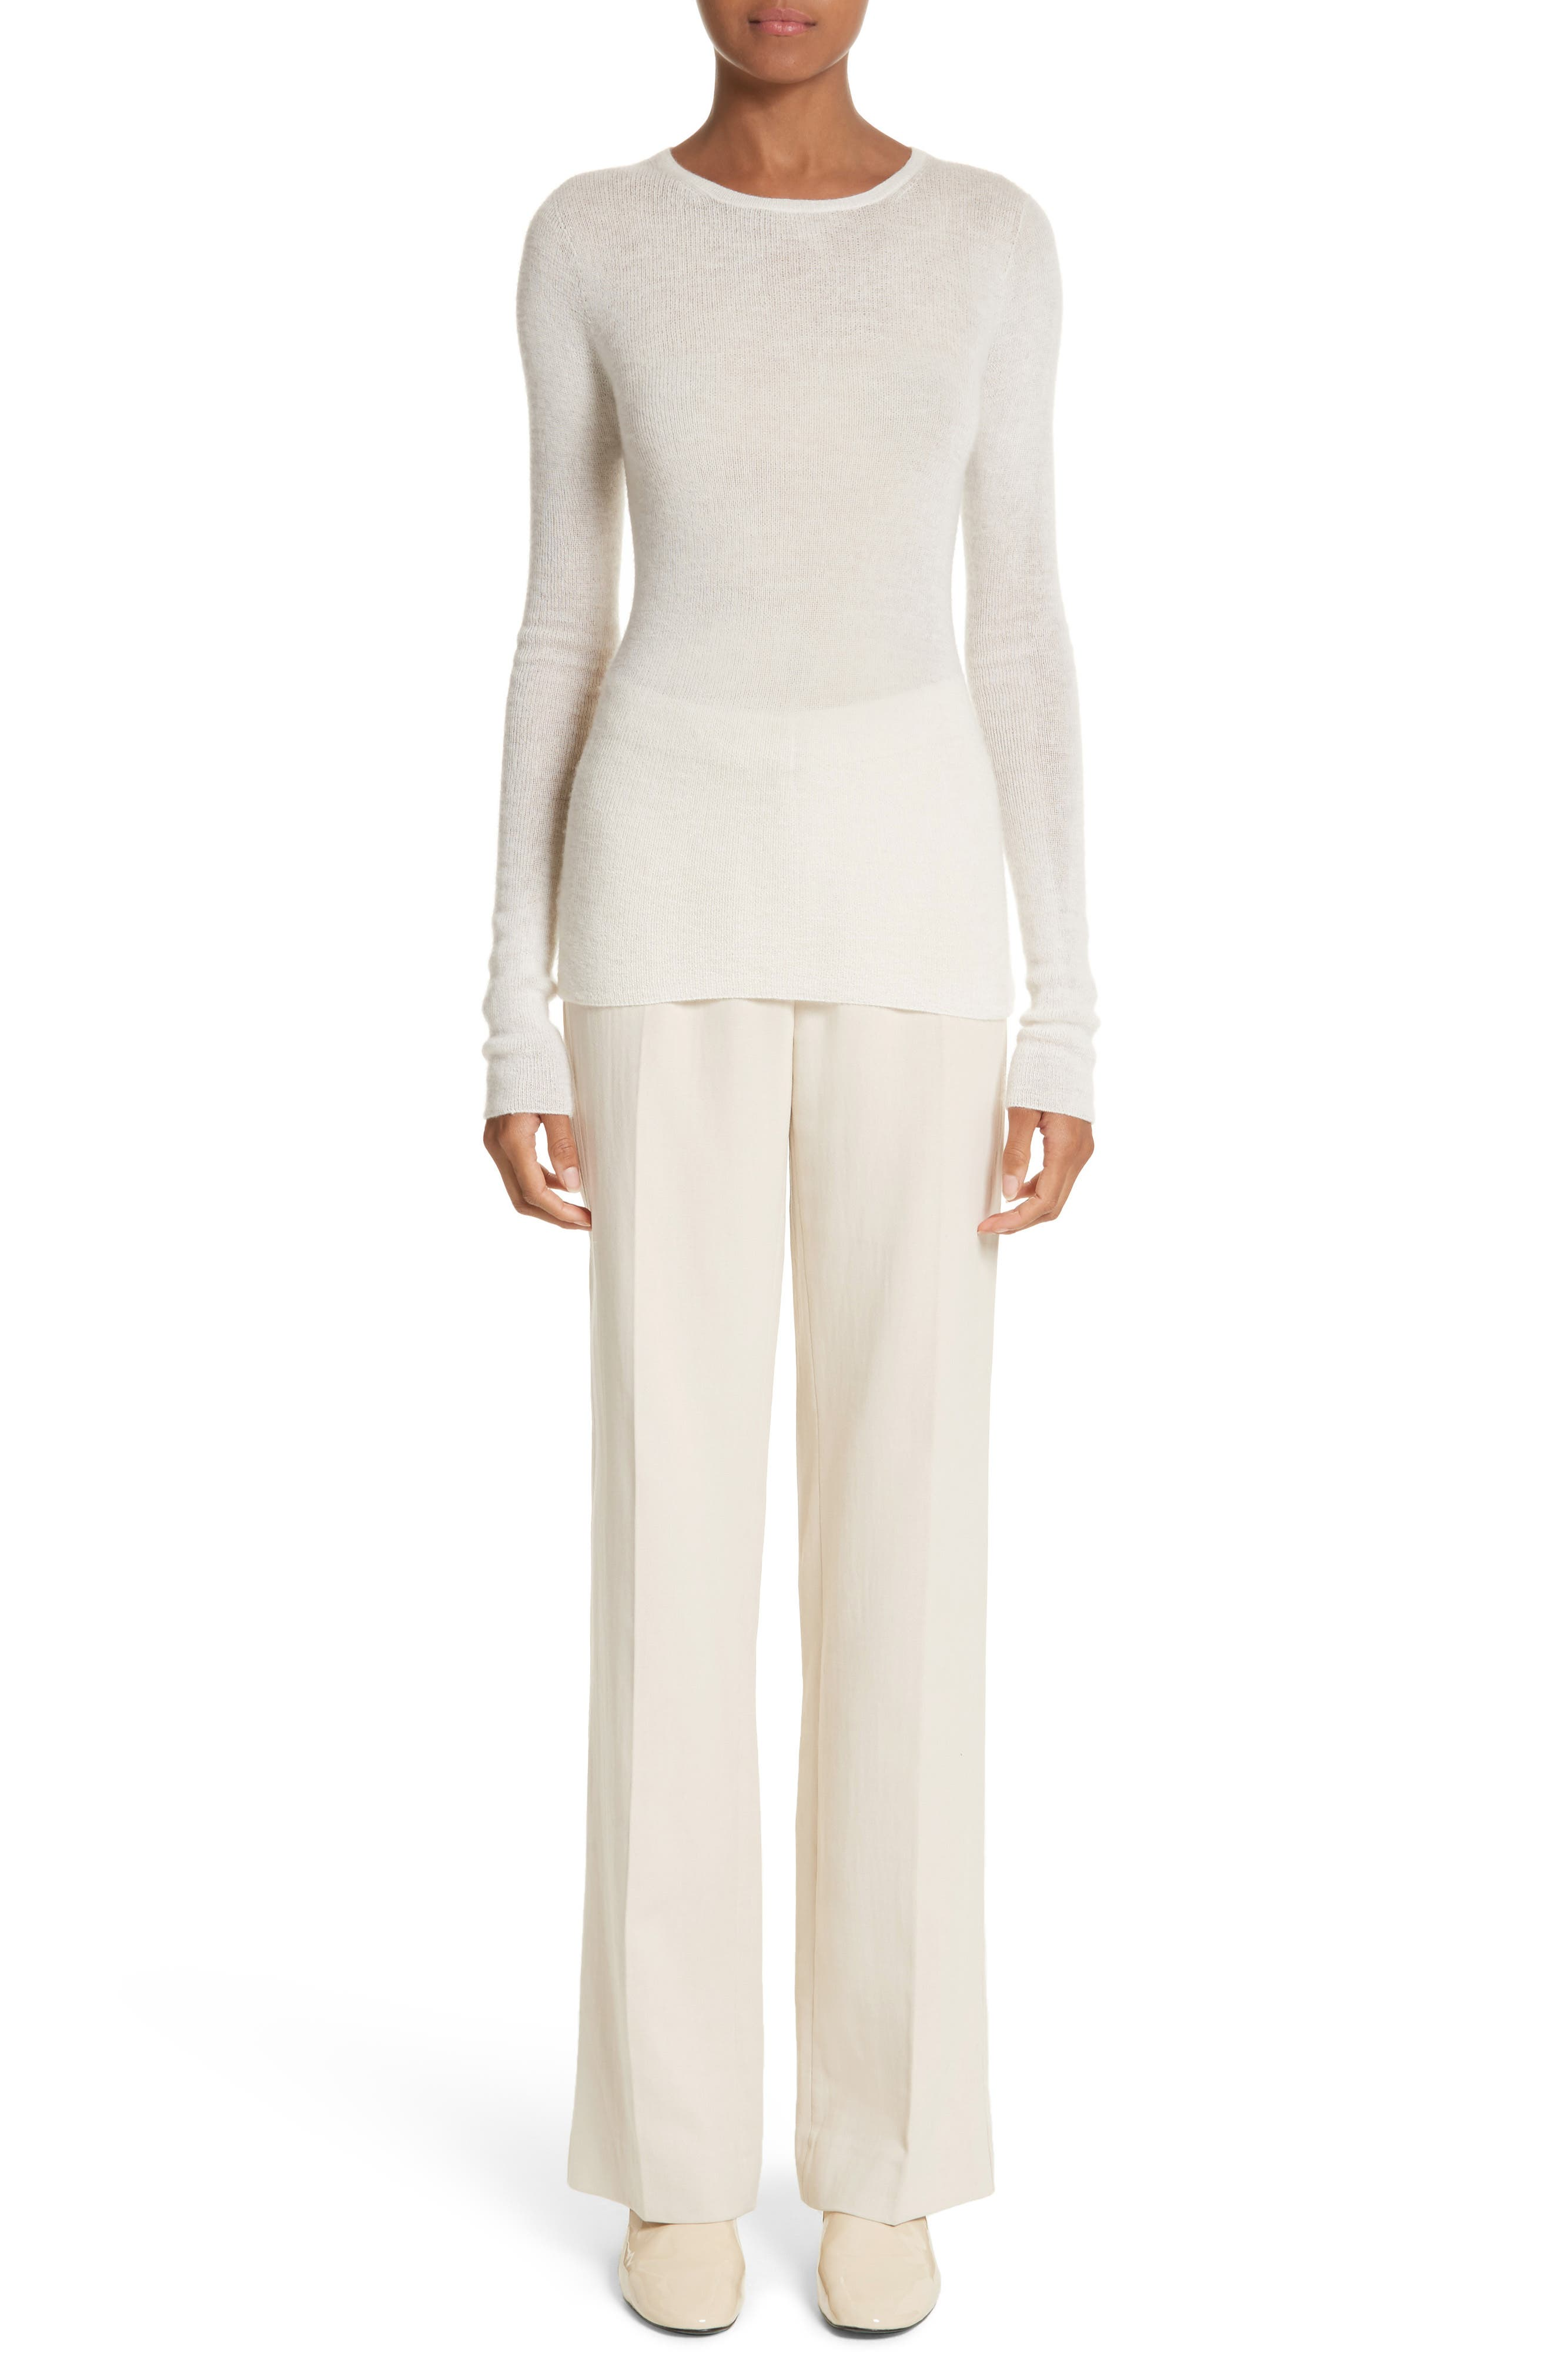 MAX MARA, Cursore Cotton Wide Leg Pants, Alternate thumbnail 7, color, 900